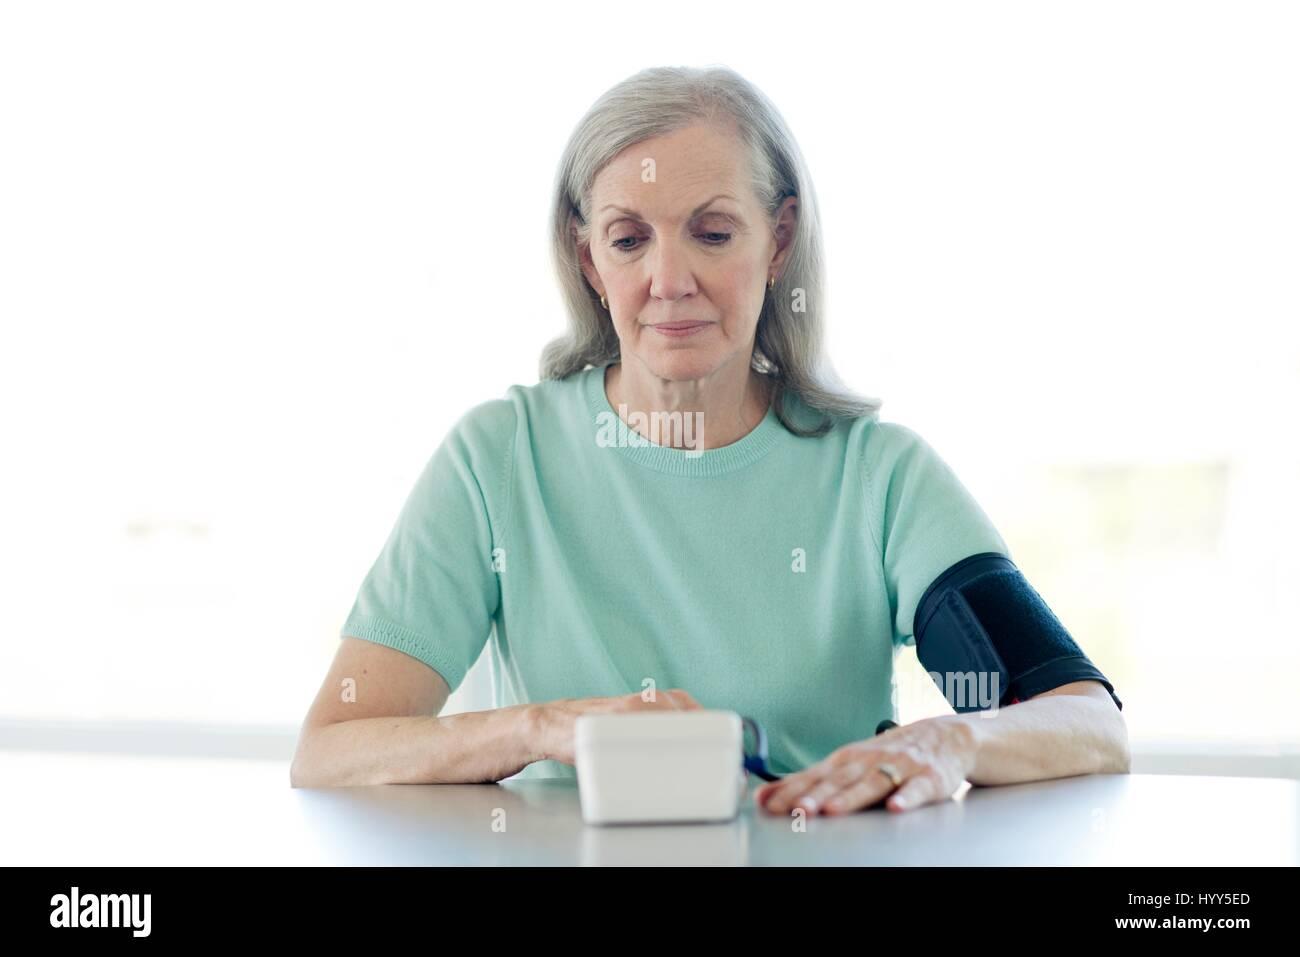 Senior woman taking her own blood pressure. Stock Photo